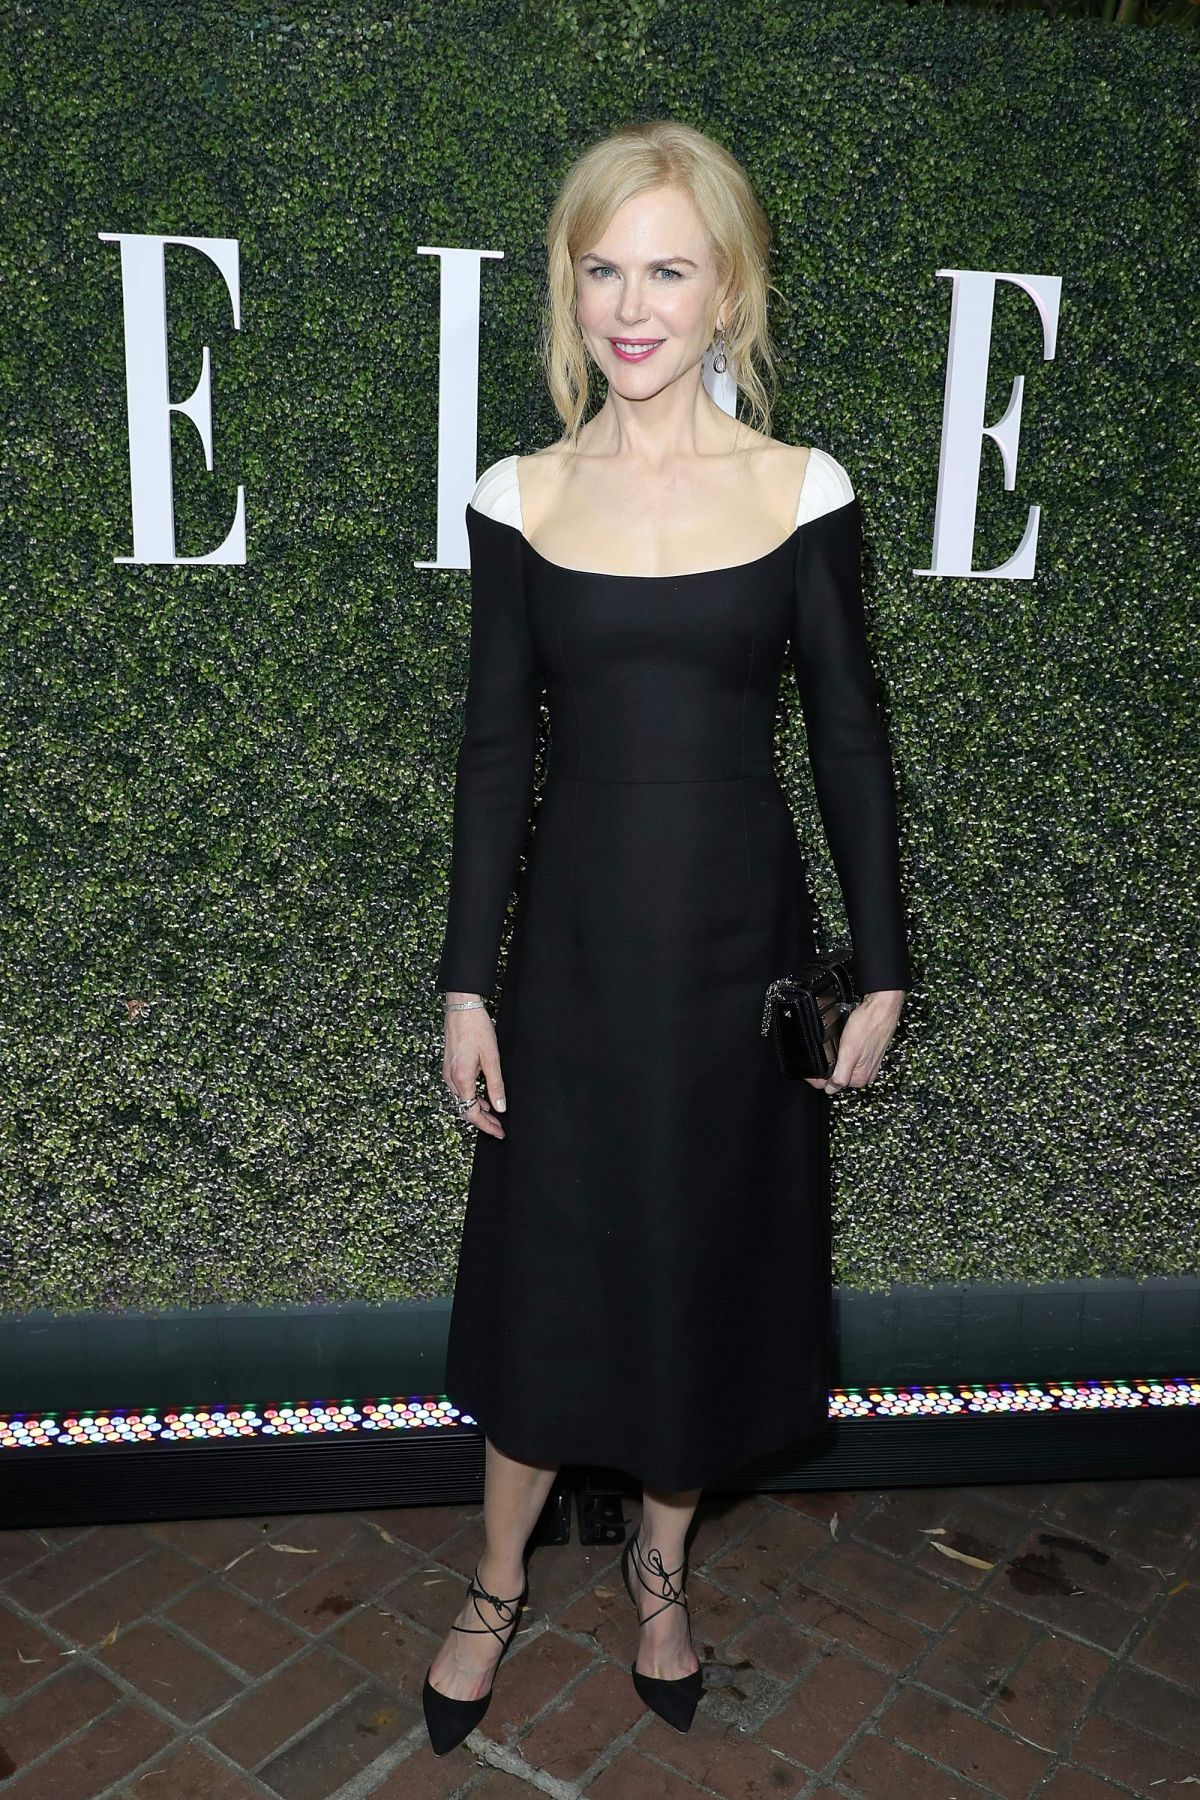 NICOLE KIDMAN at Elle Women in Television Celebration in Los Angeles 01/14/2017